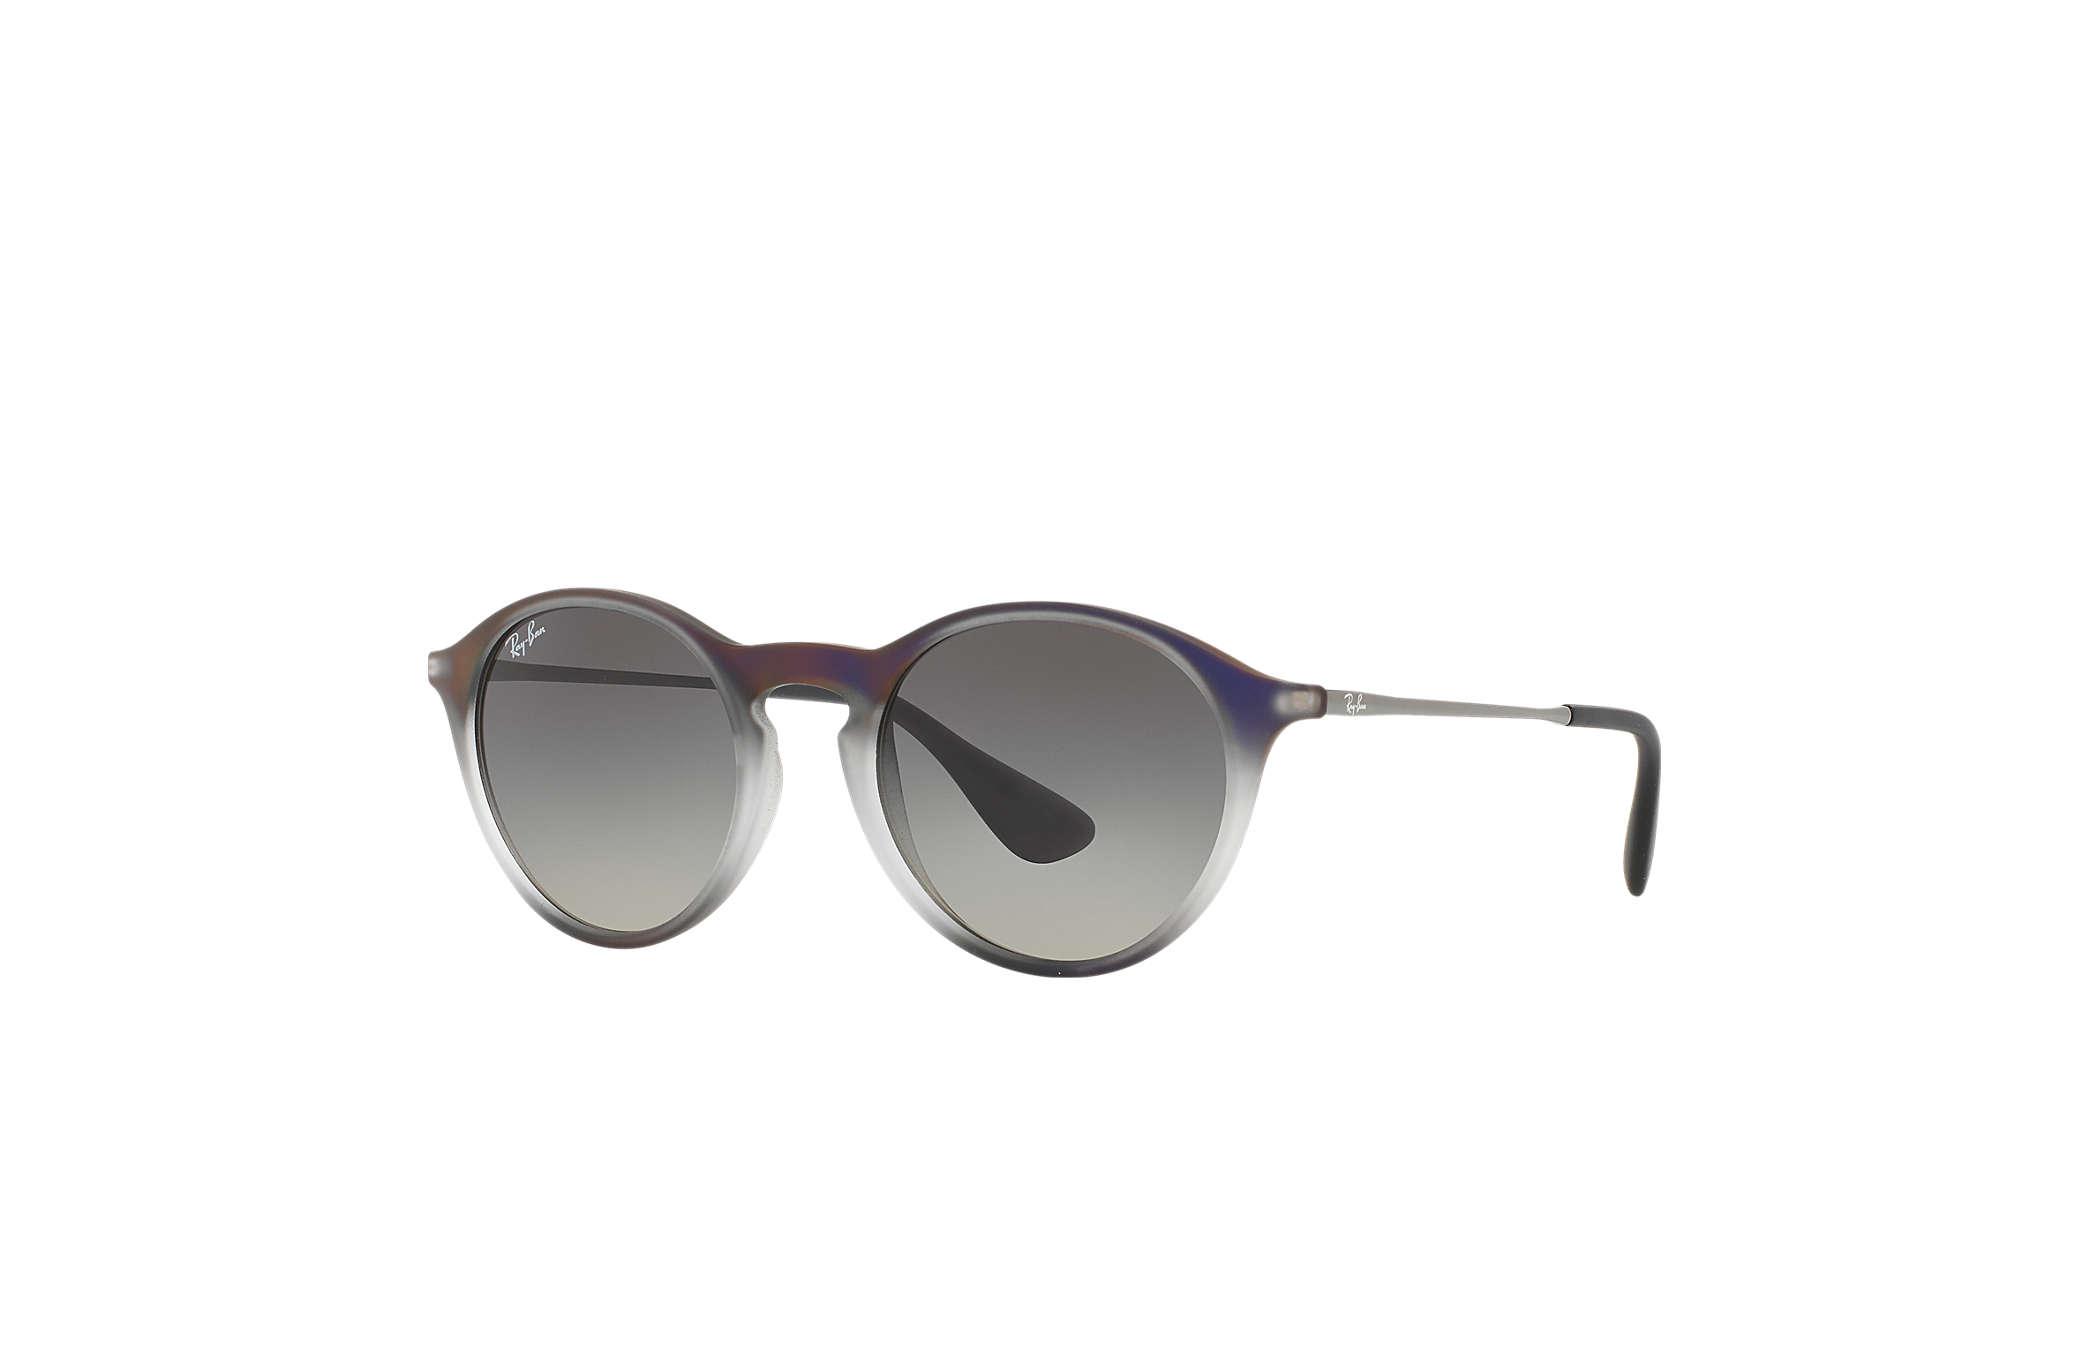 5e96e29be9d7 ... wayfarer urban sunglasses rb2140 606471 camo 83b49 c49be uk ray ban  0rb4243 rb4243 violetgrey gunmetal sun 90465 83d89 ...